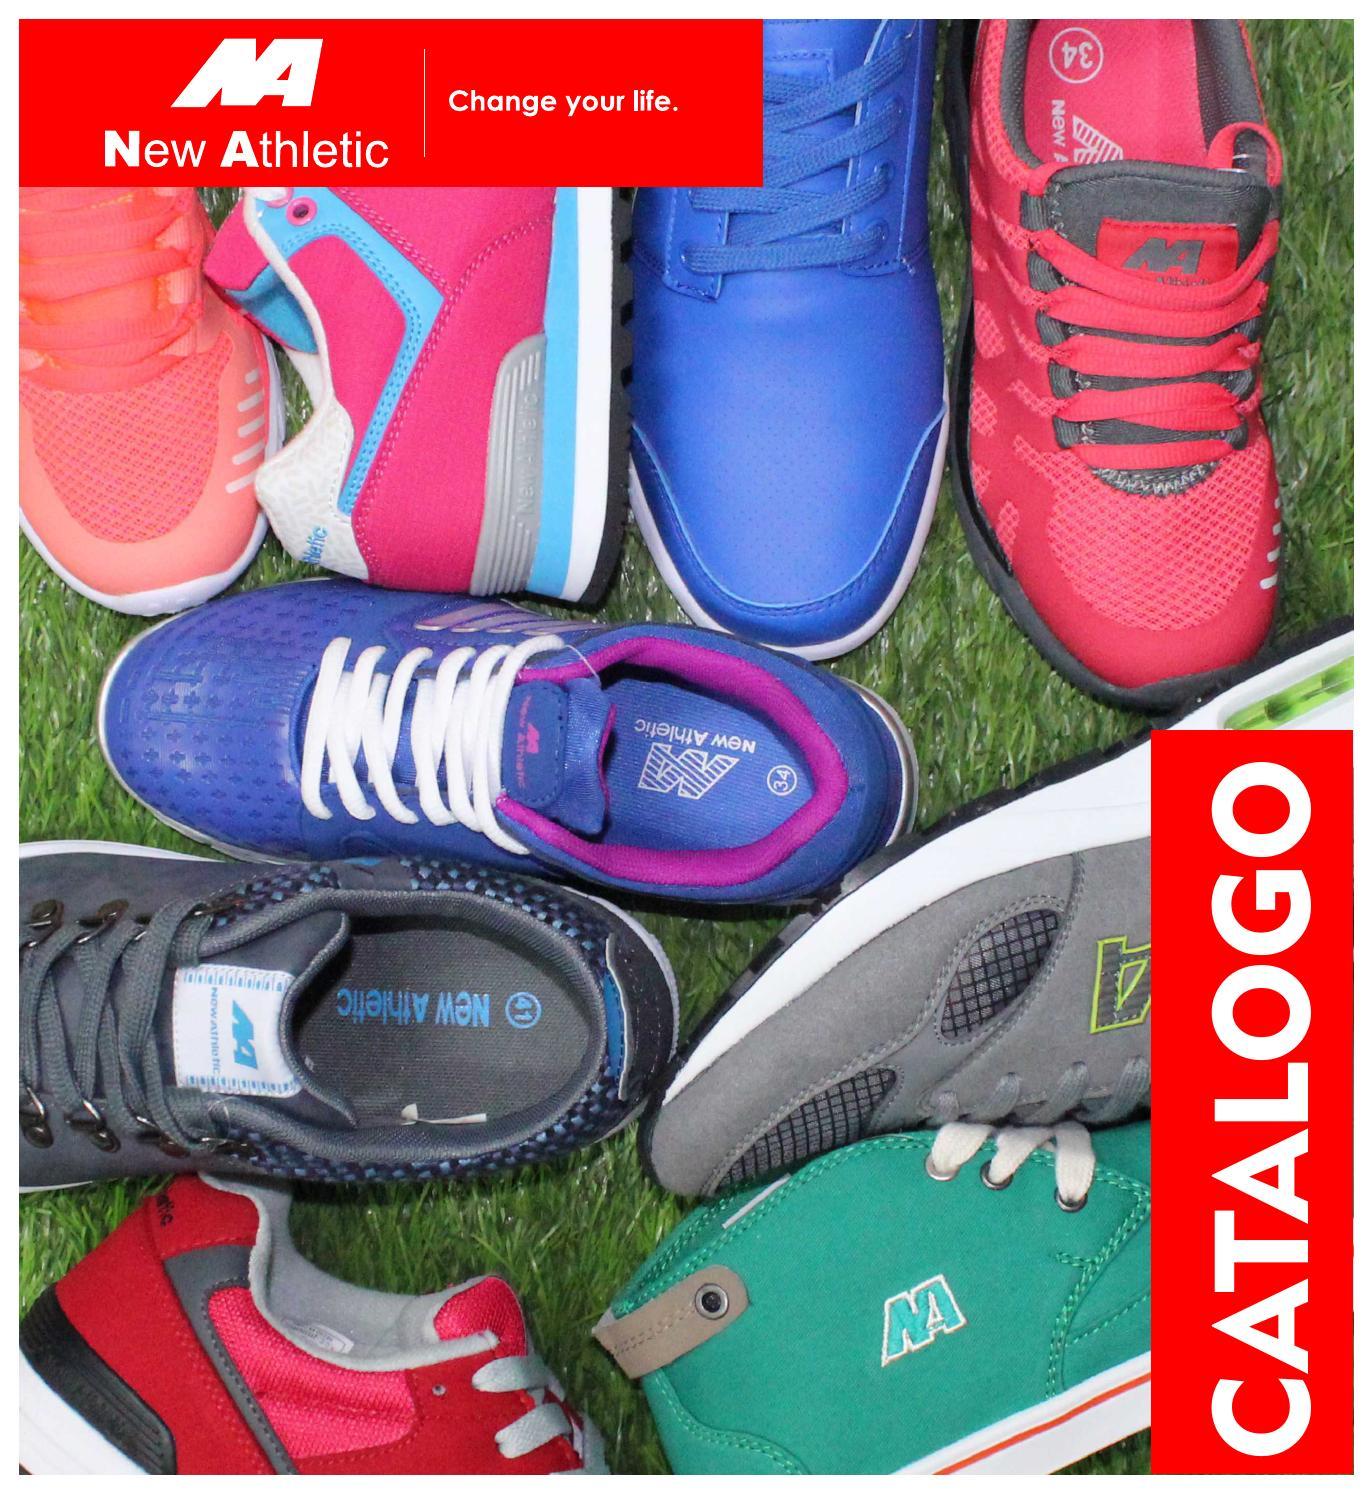 087617c7 Catalogo New Athletic N° 01-2014 by New Athletic - issuu